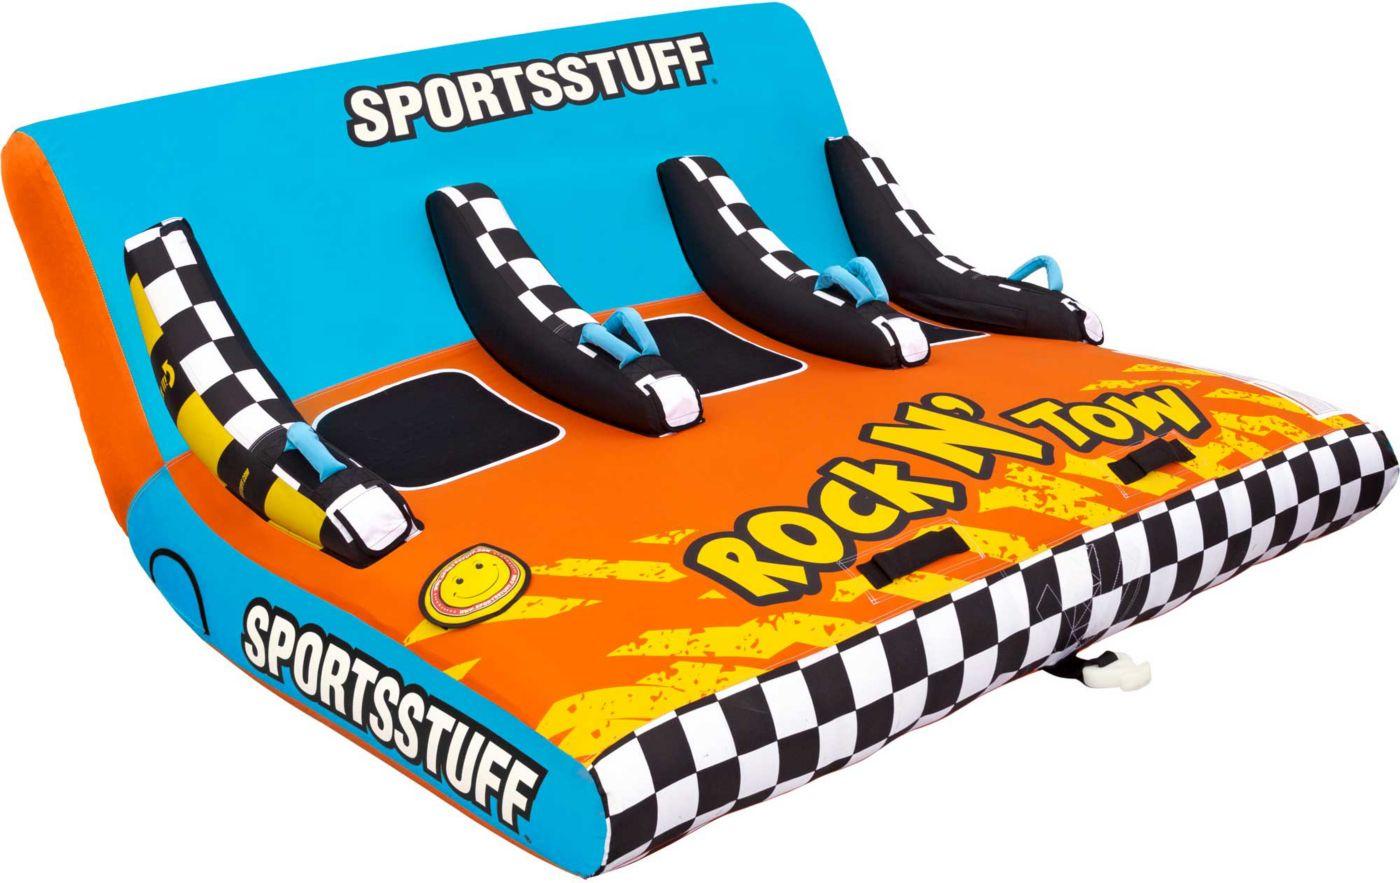 Sportsstuff Rock N' Tow 3-Person Towable Tube